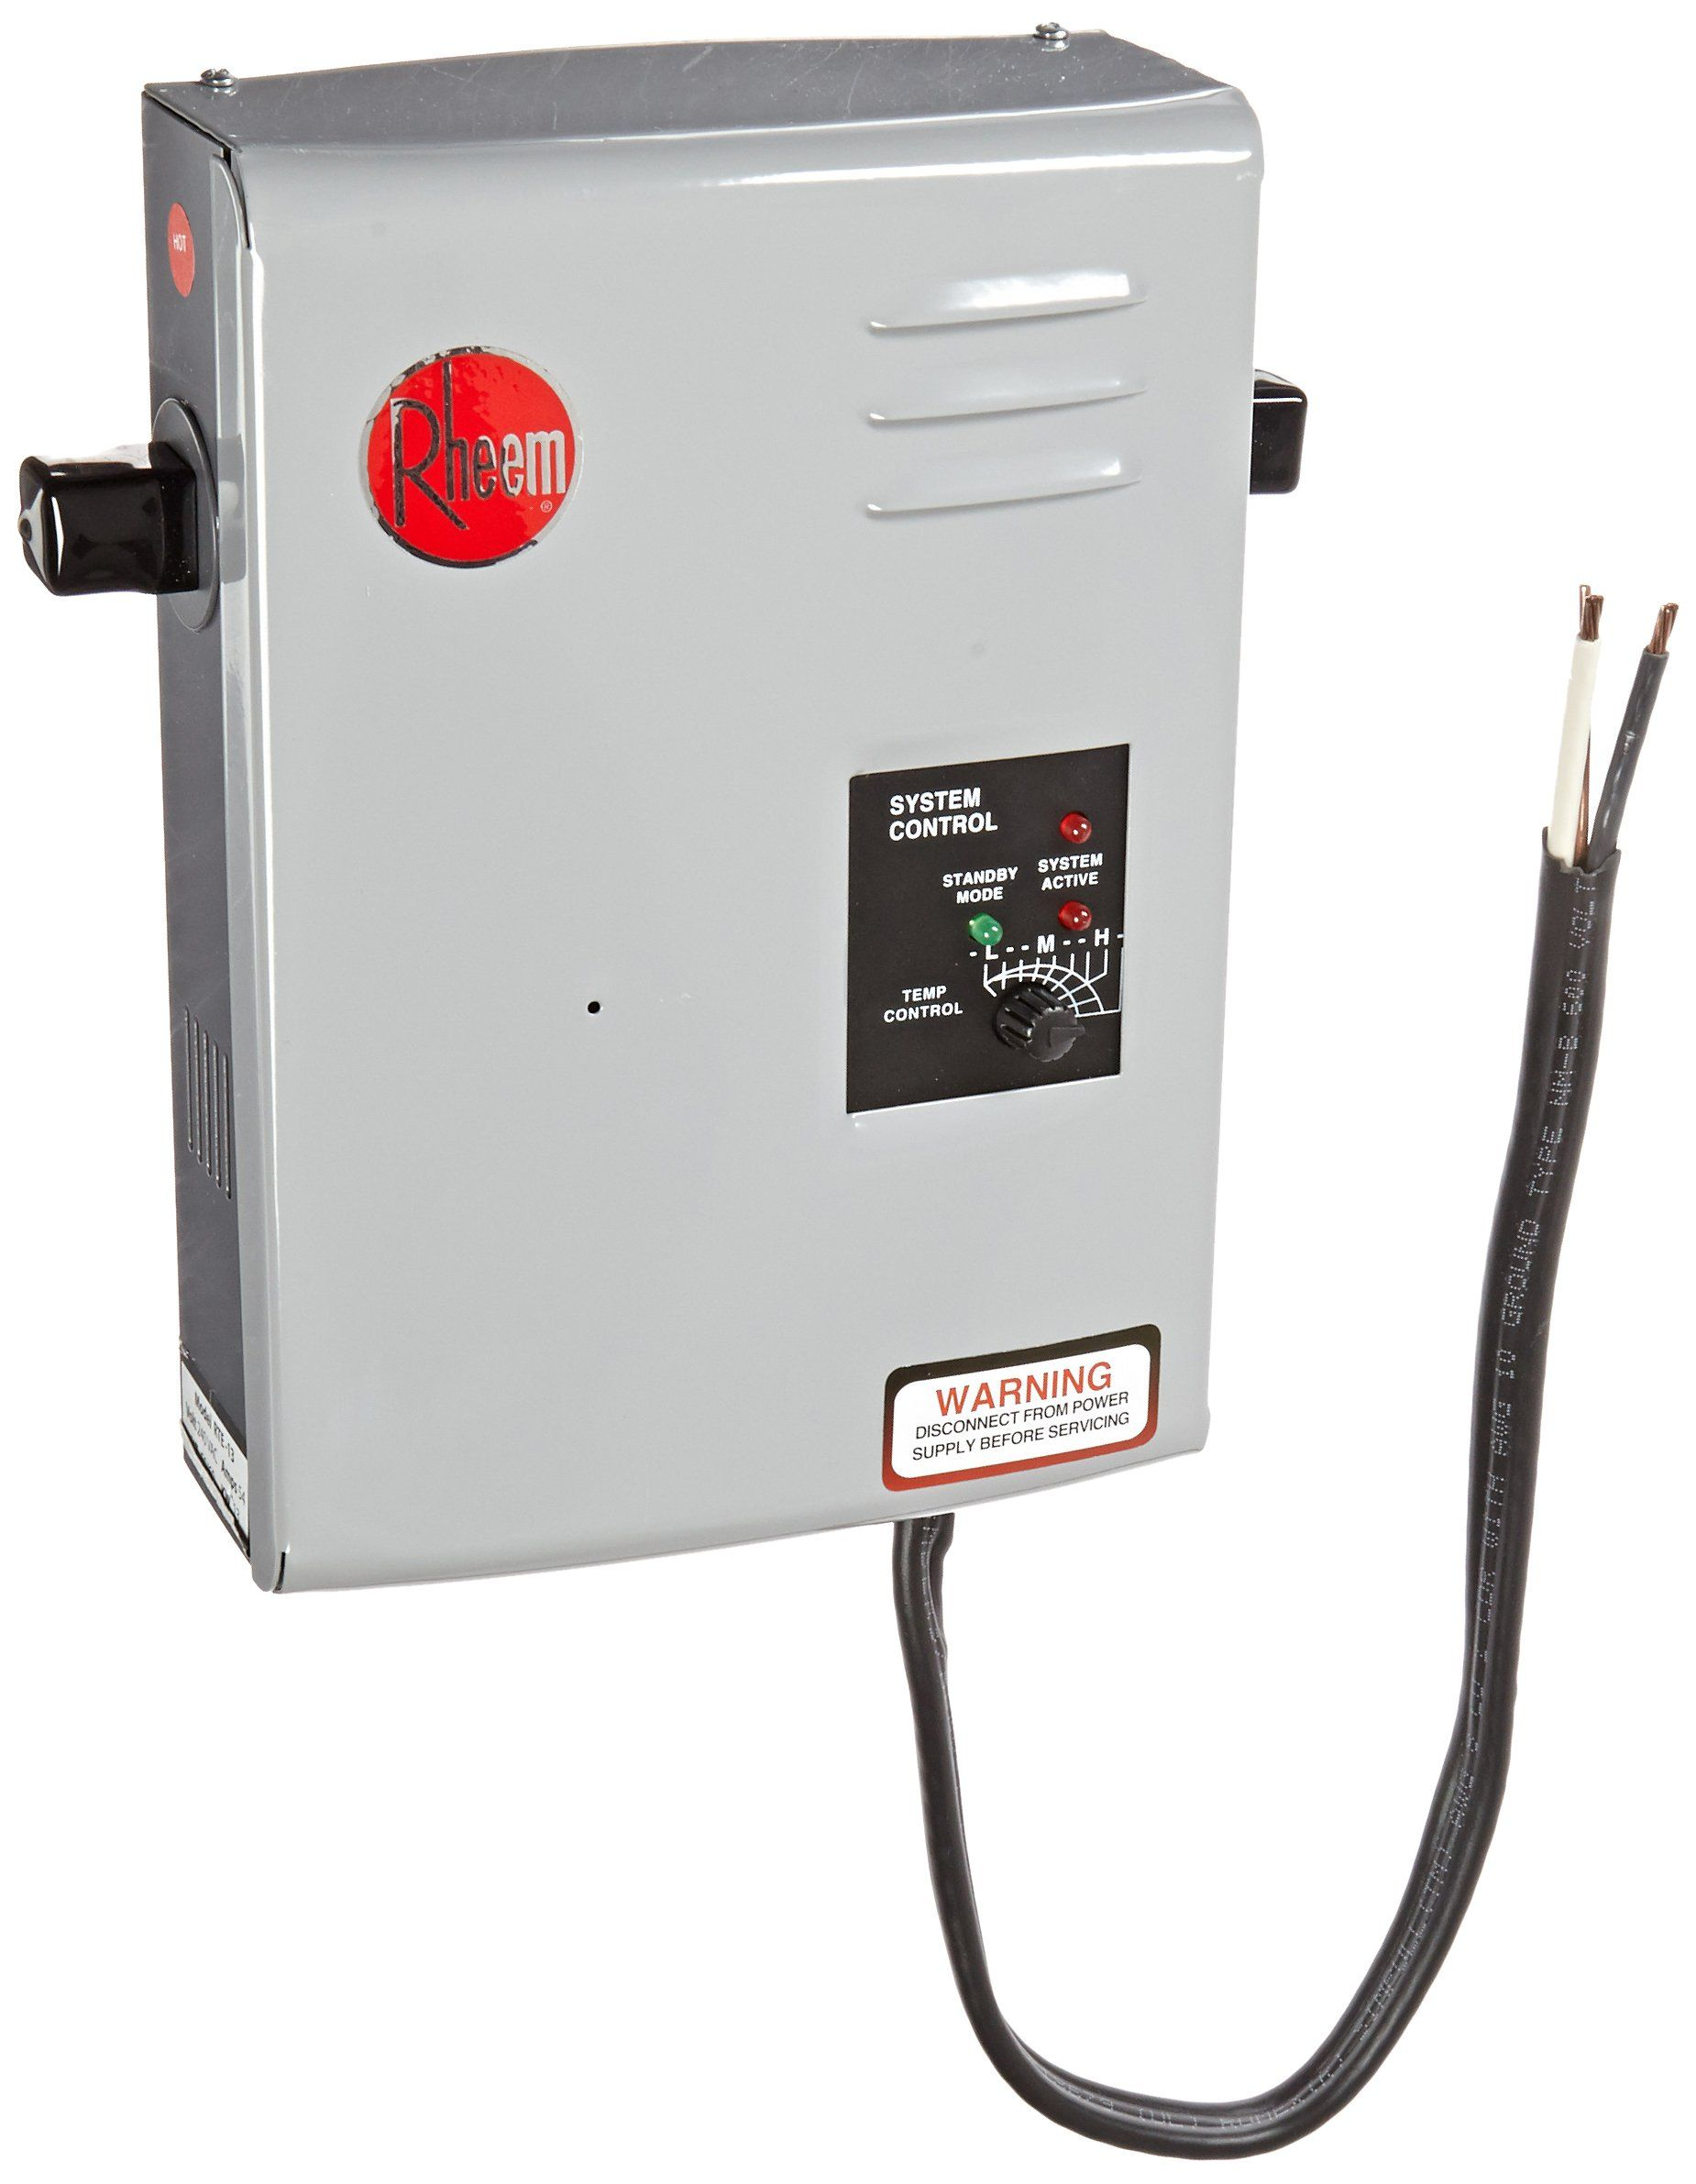 Rheem Rte 13 Electric Tankless Water Heater 4 Gpm Amazon Com Tankless Hot Water Heater Tankless Water Heater Electric Tankless Water Heater